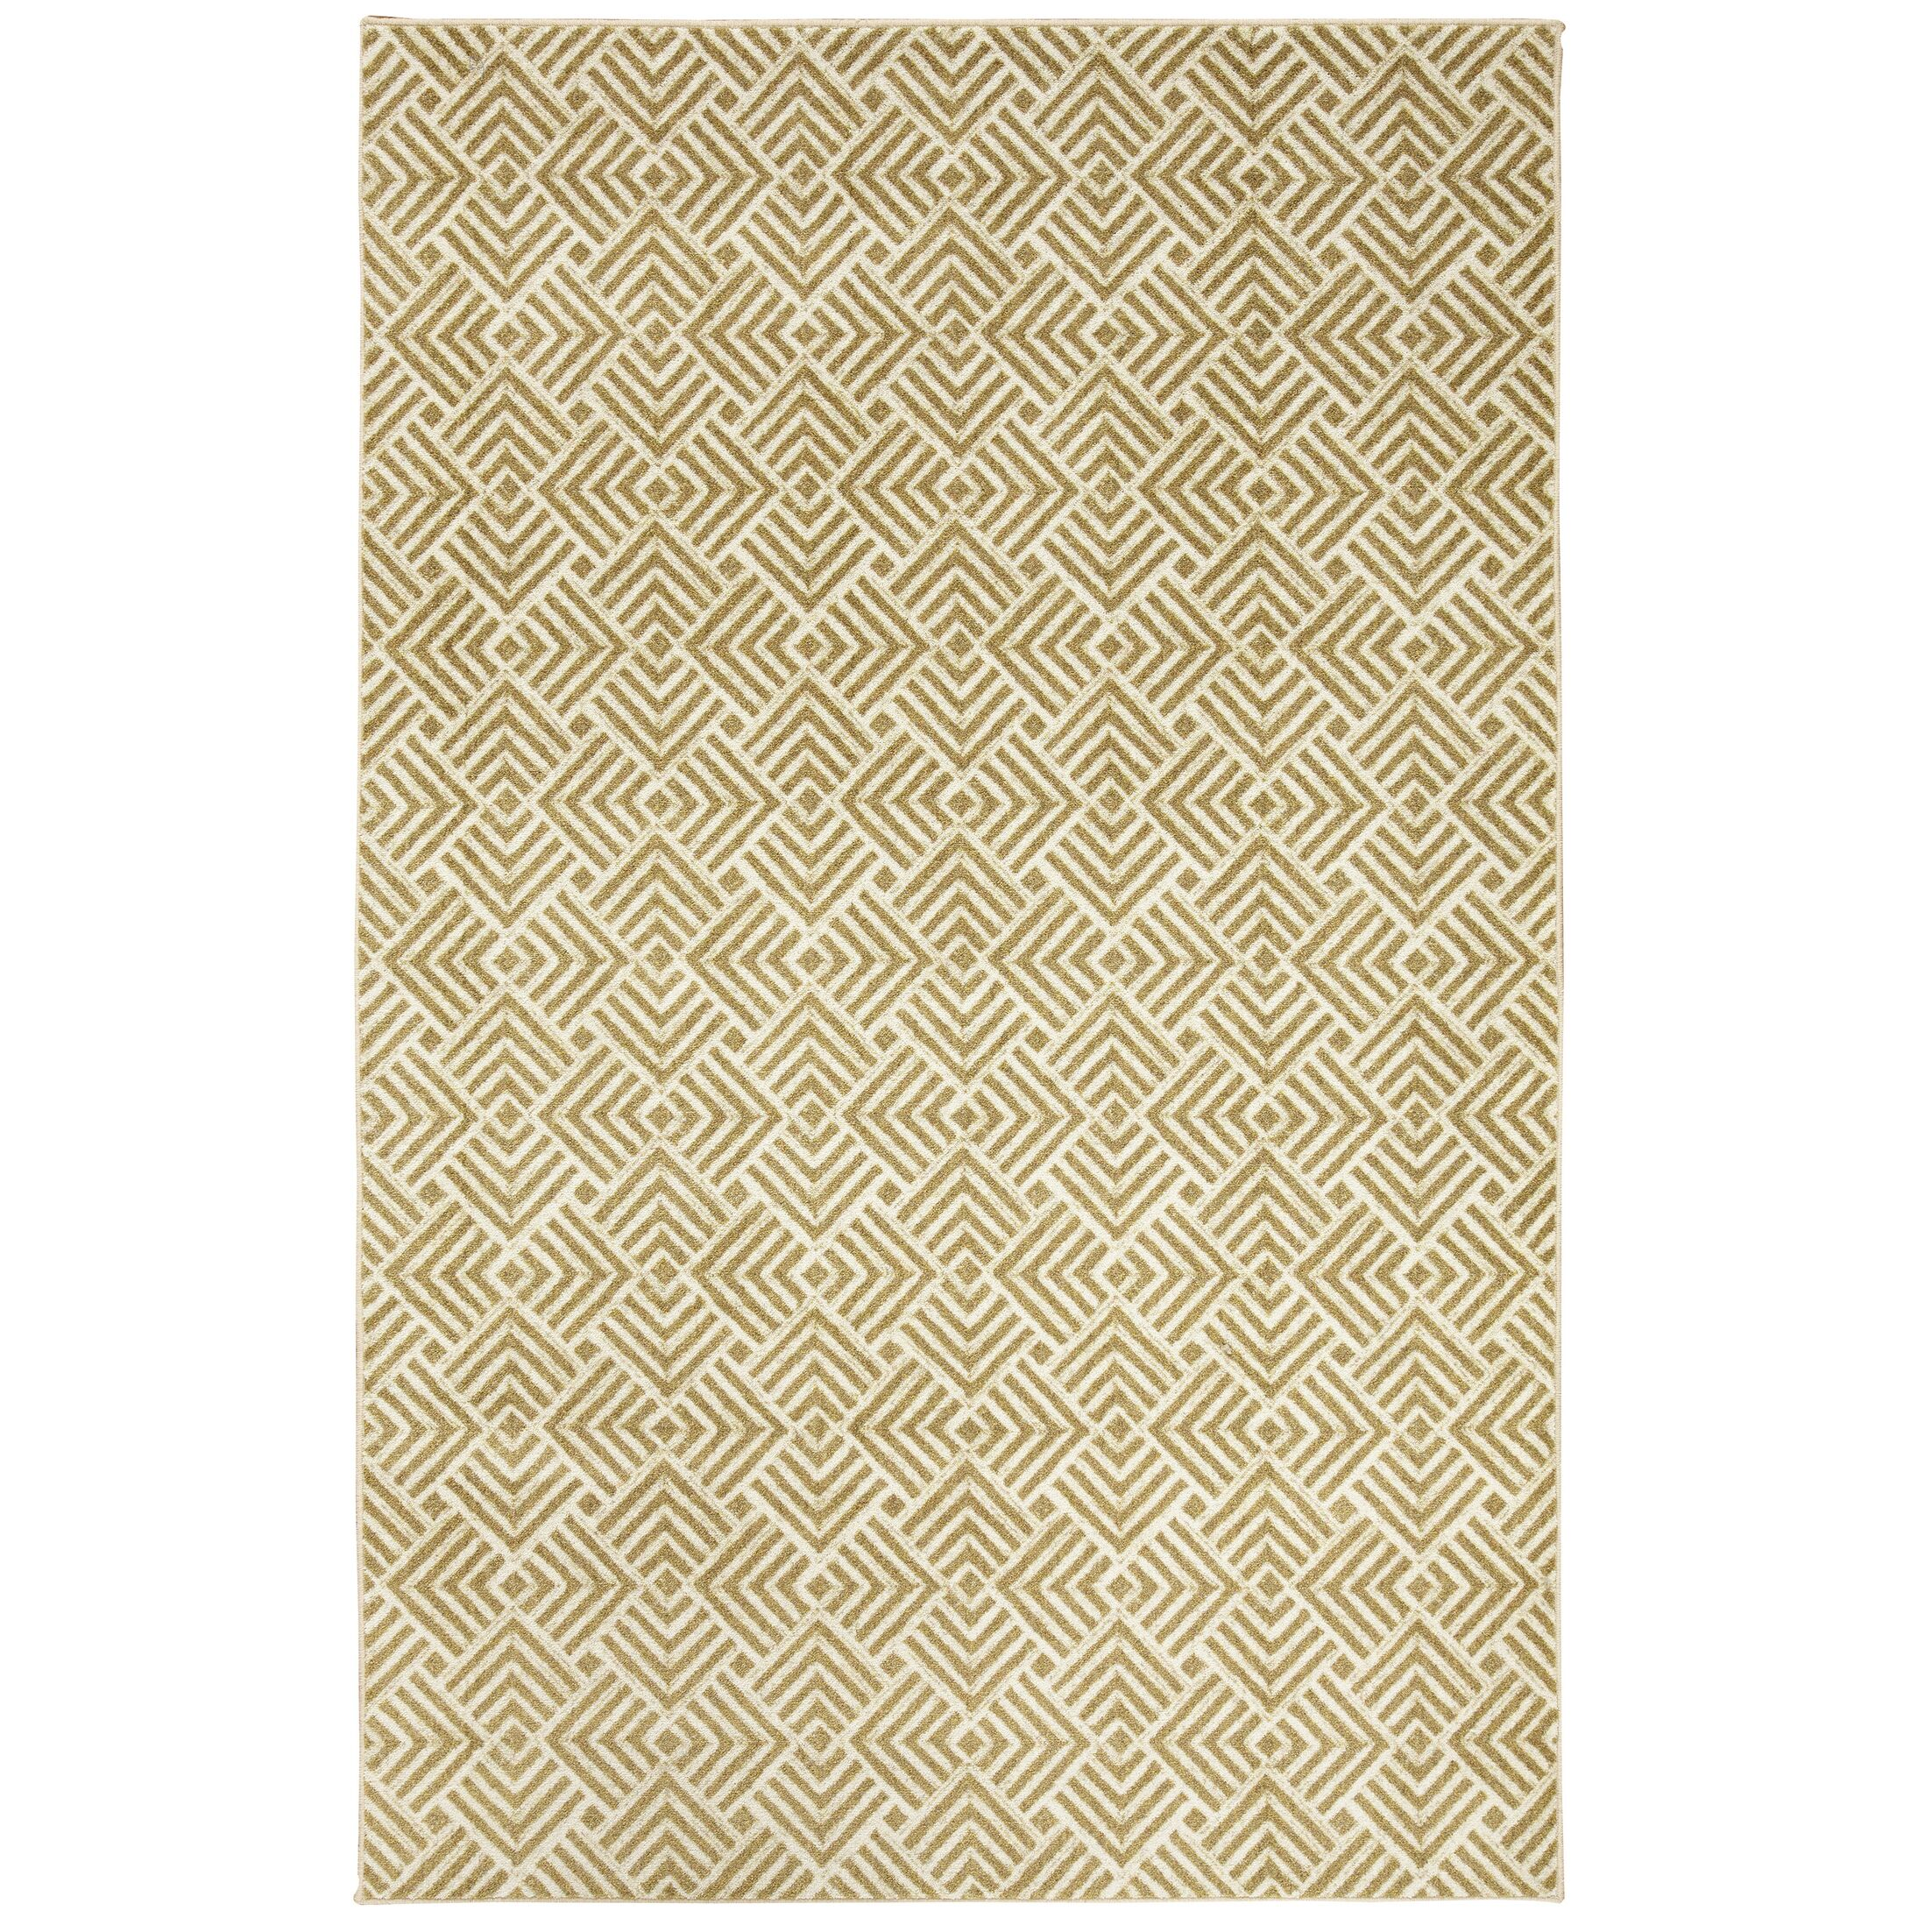 Kerber Diamond Maze Gold/Ivory Area Rug Rug Size: Rectangle 8' x 10'